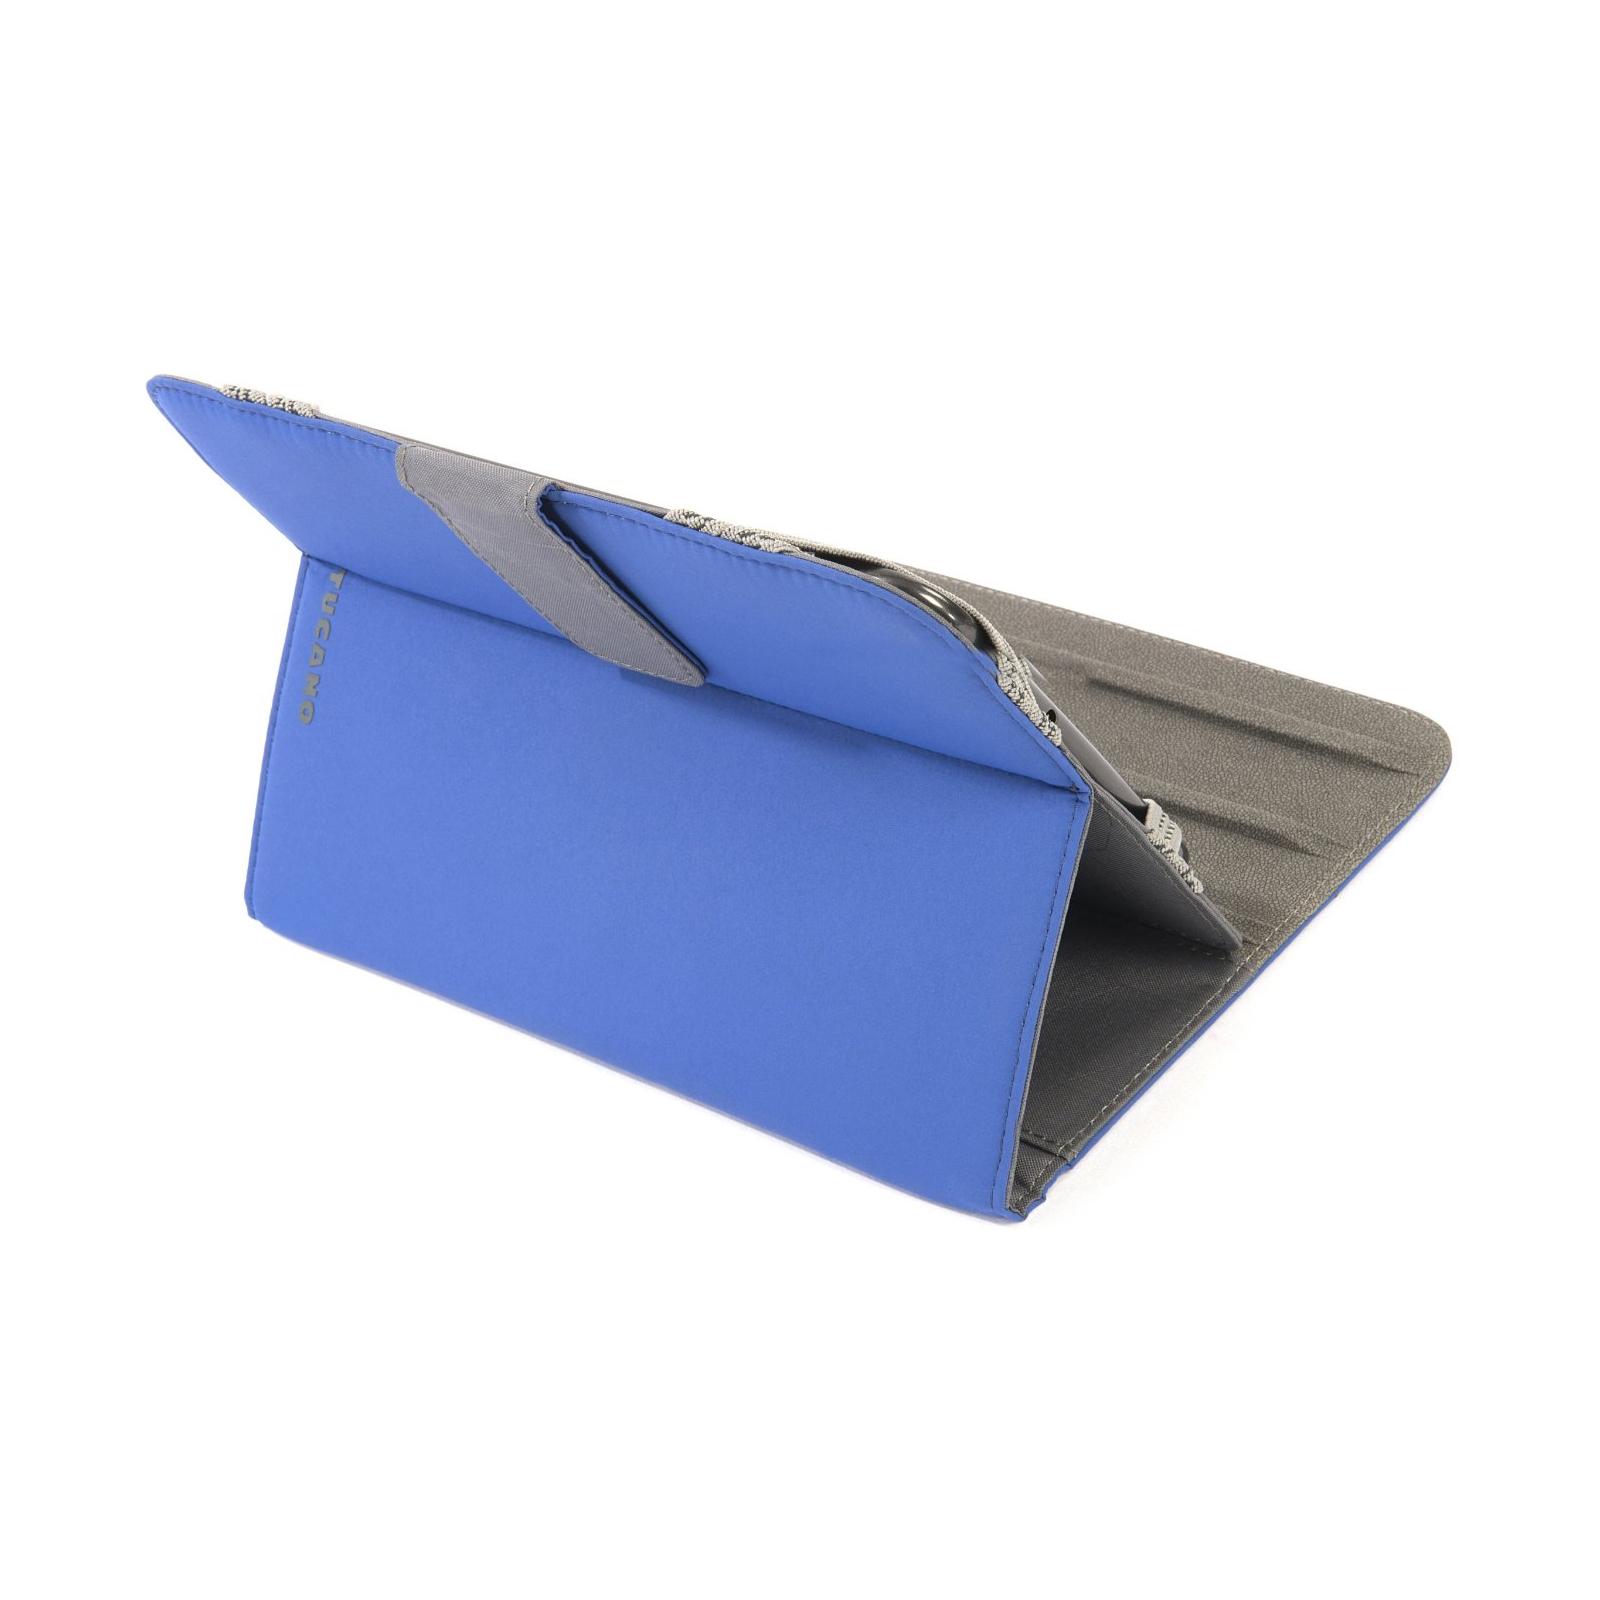 "Чехол для планшета Tucano 7"" Facile Stand Blue (TAB-FA7-B) изображение 6"